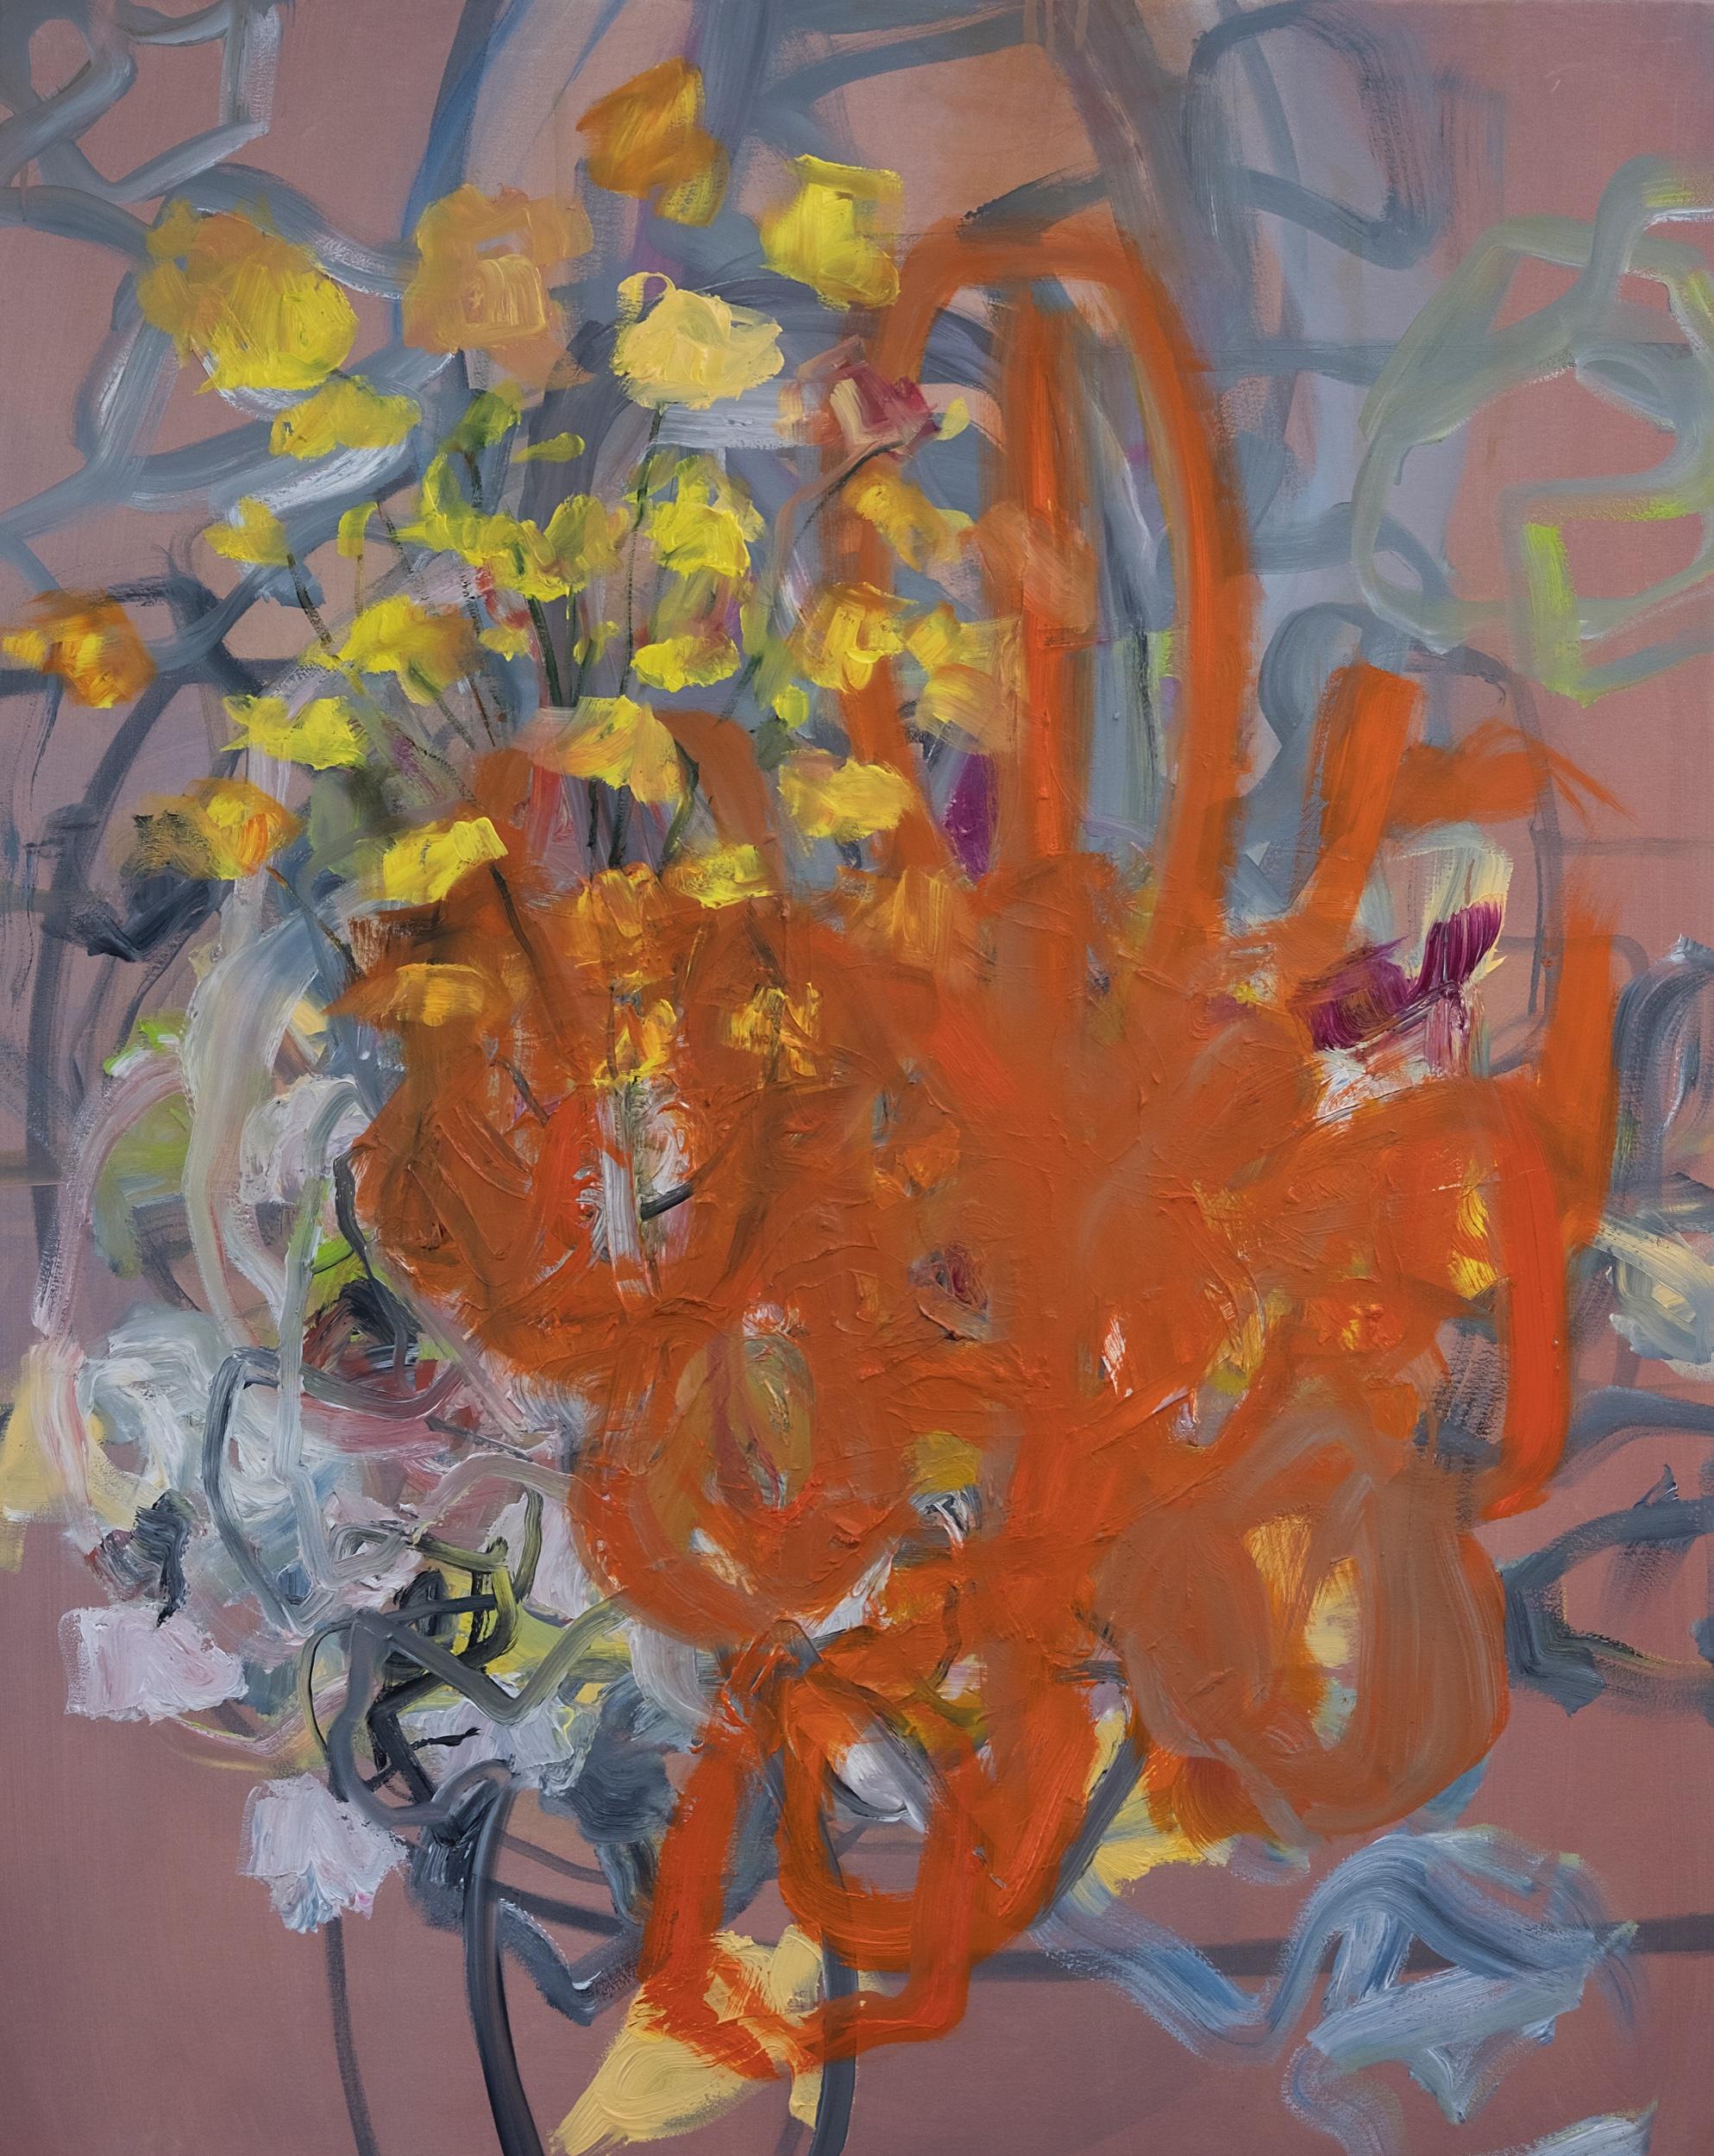 Orange Light, 2018. Oil on canvas, 100 x 80 cm.